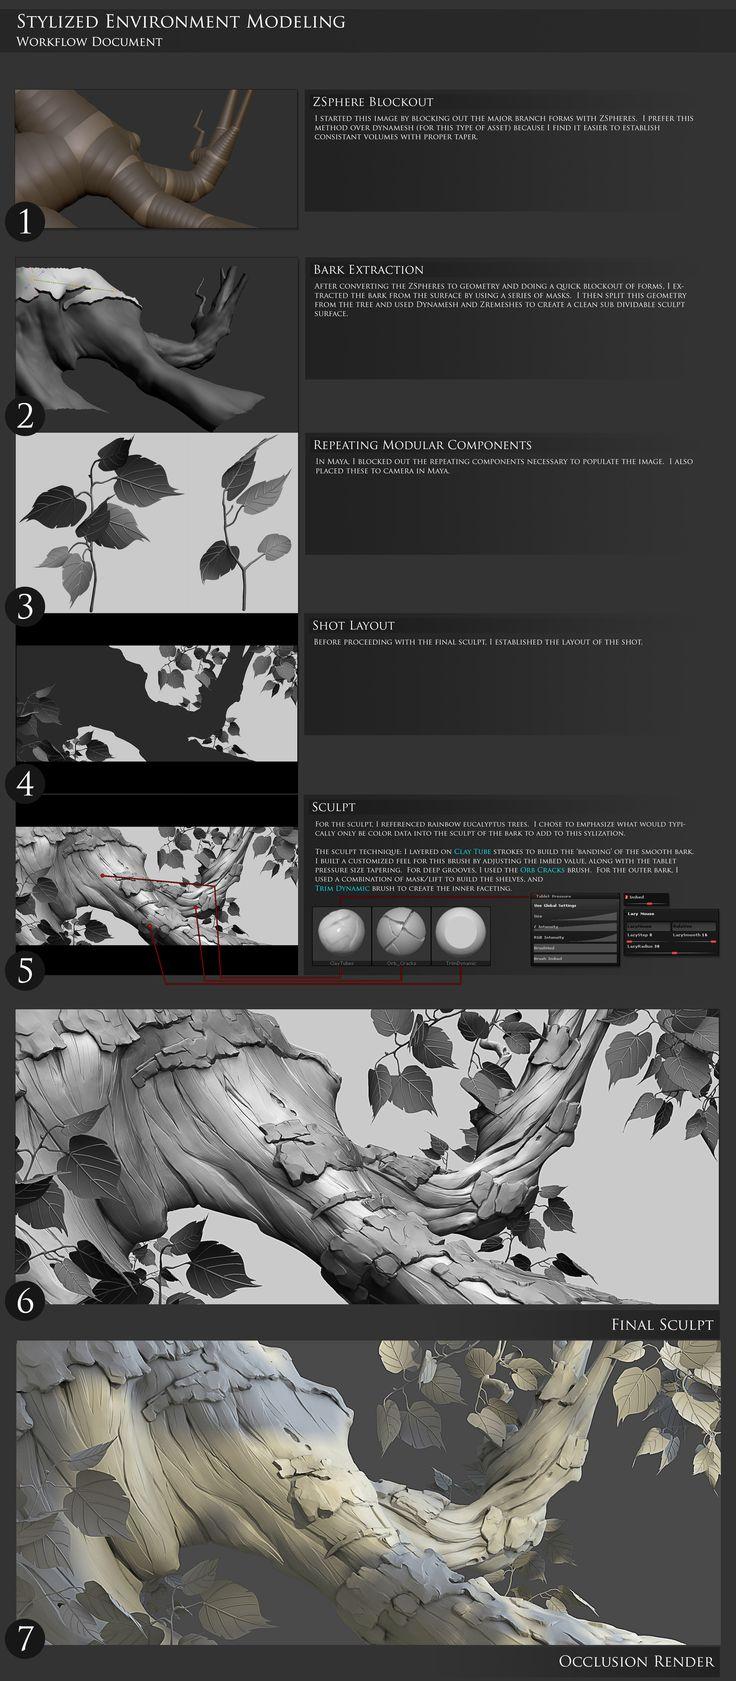 ArtStation - Stylized Tree Sculpt, Aaron Hamman